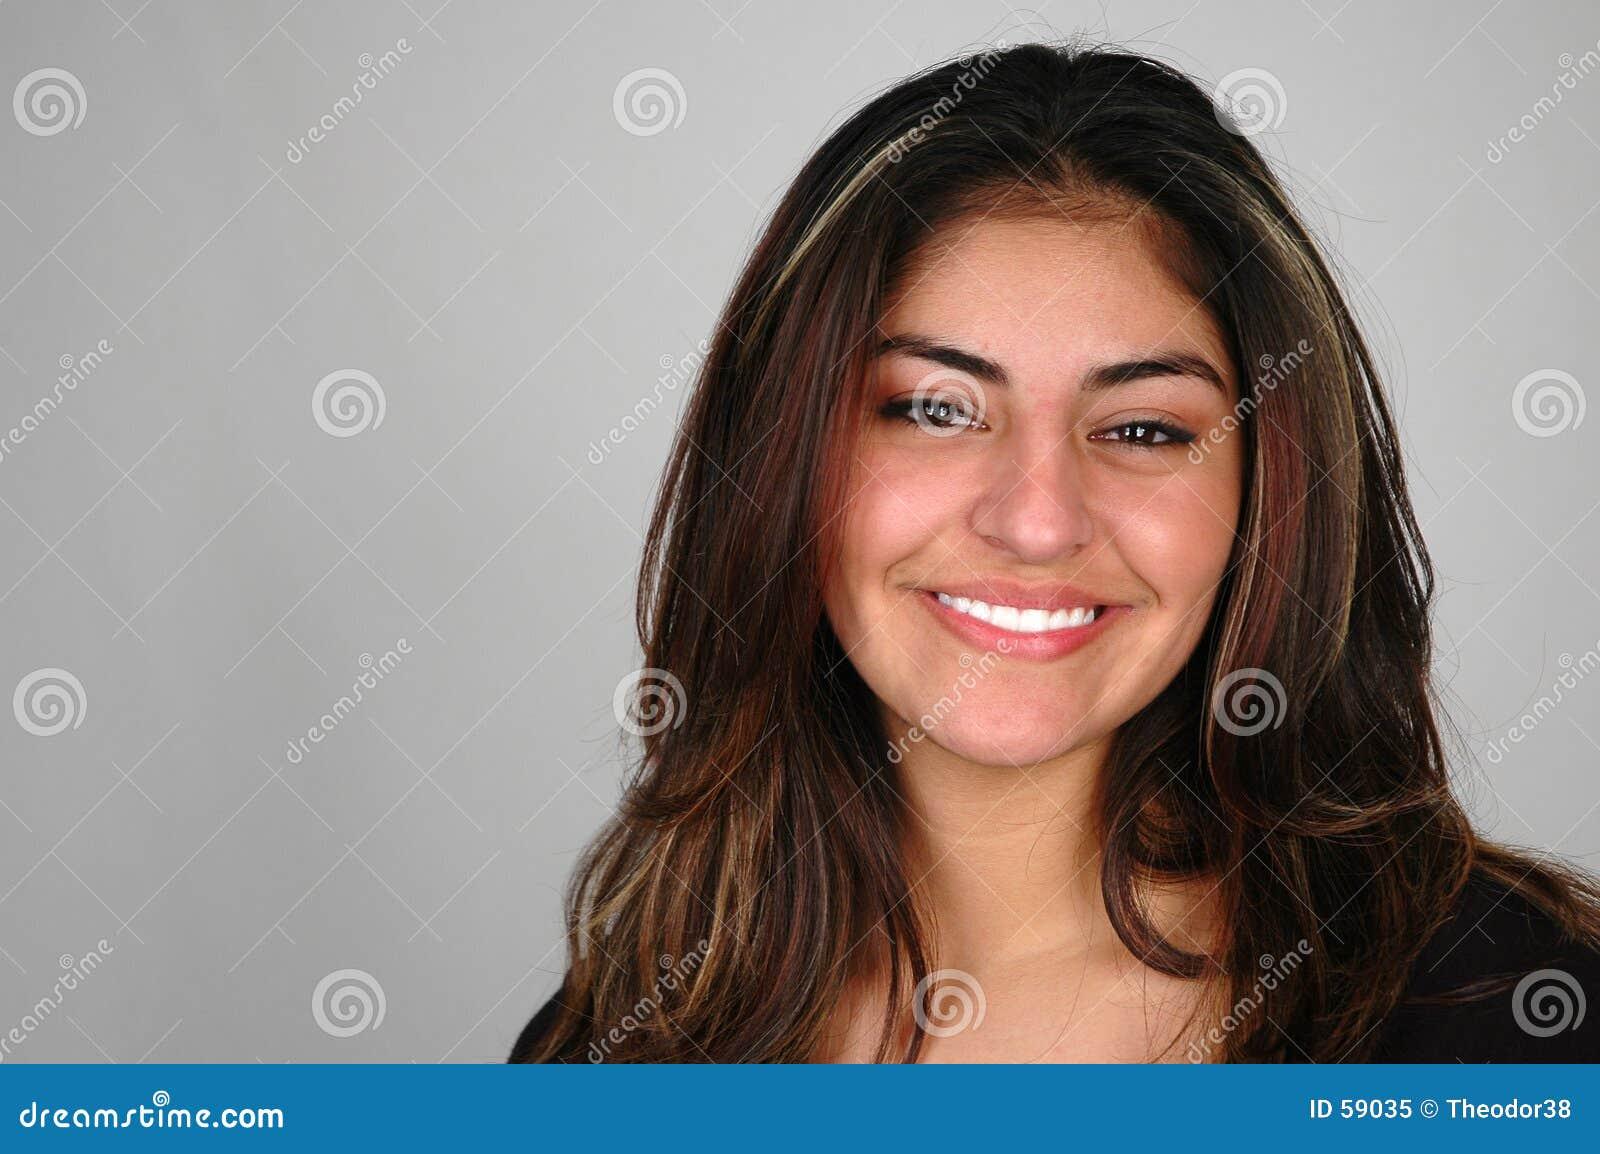 Woman-16 ocasional